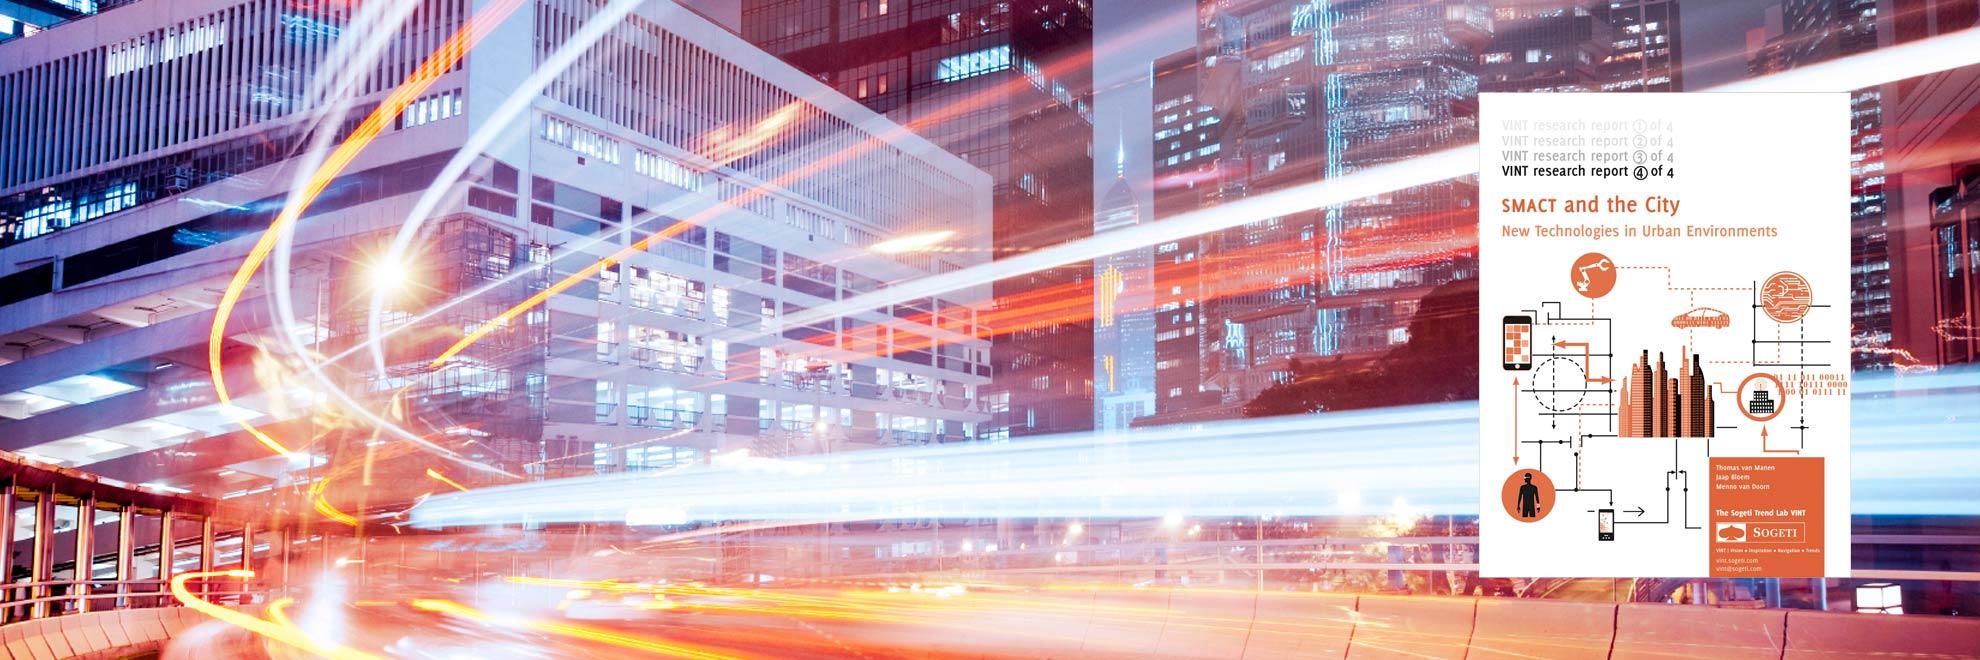 Vint Research 4 Smart Cities